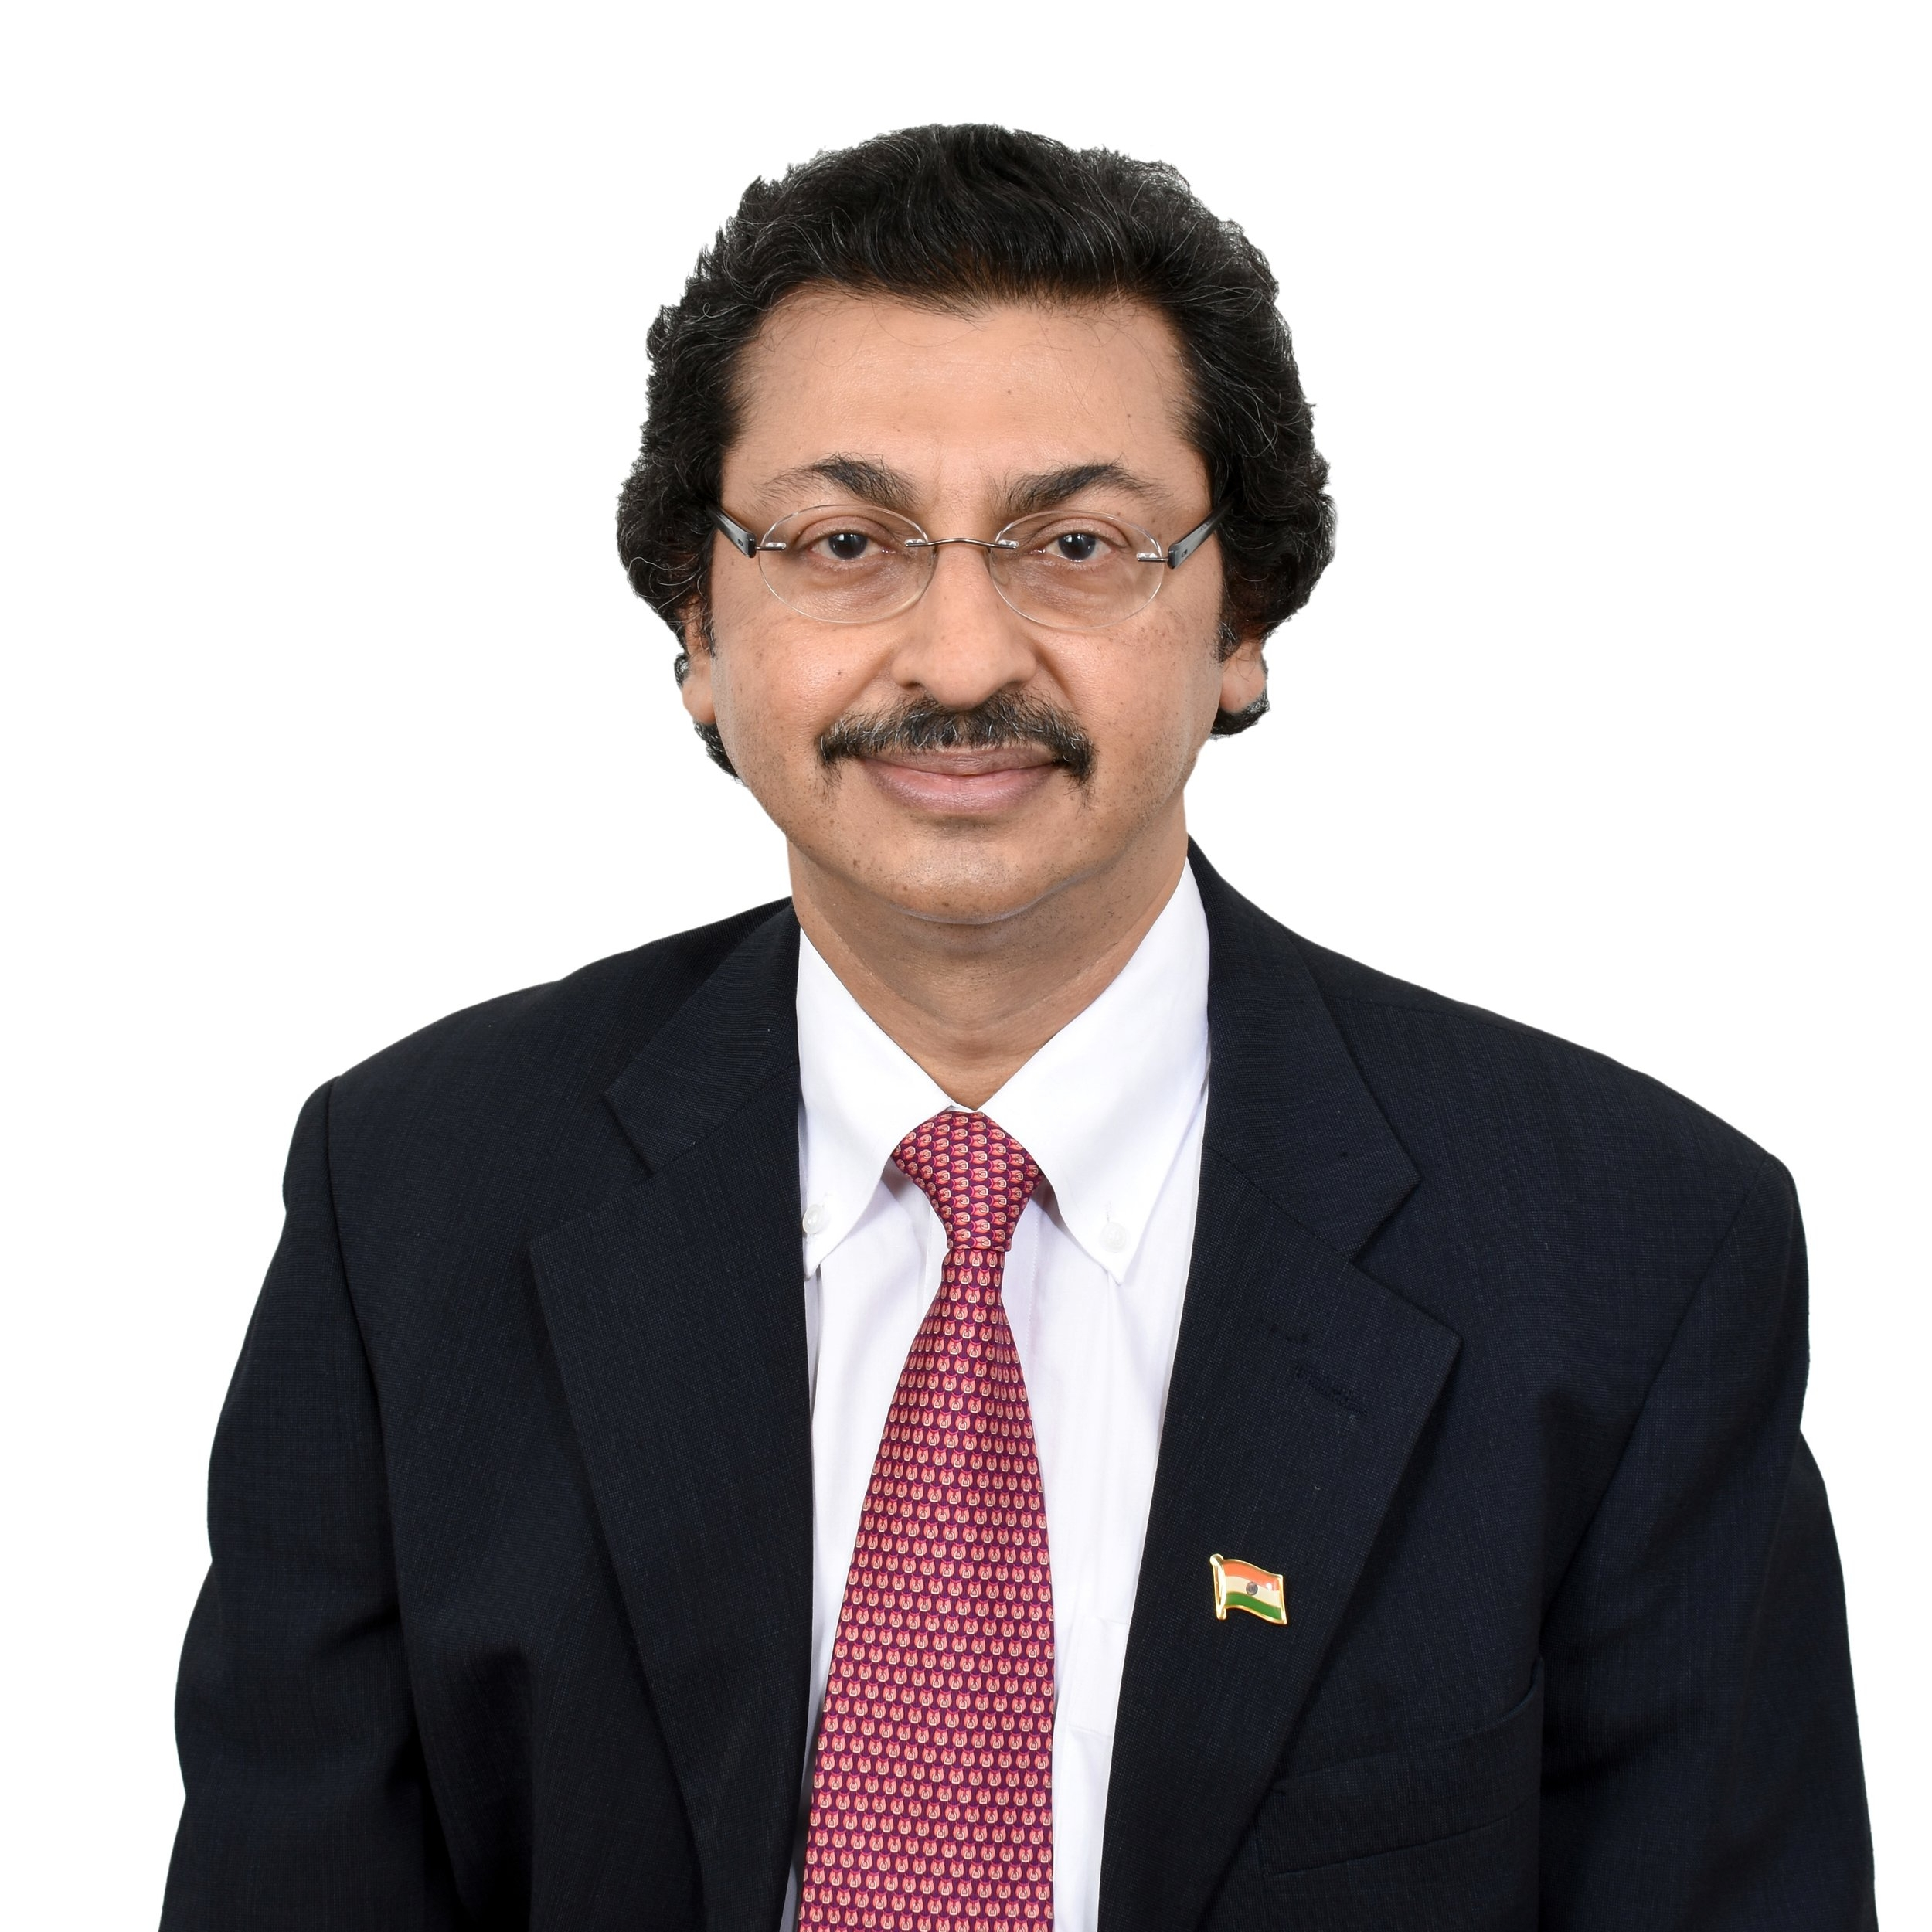 Mr. Gautam N. MehraCOUNCIL VICE CHAIRMAN - Chairman & Managing Director - Savita Oil Technologies Limited, Mumbai, India